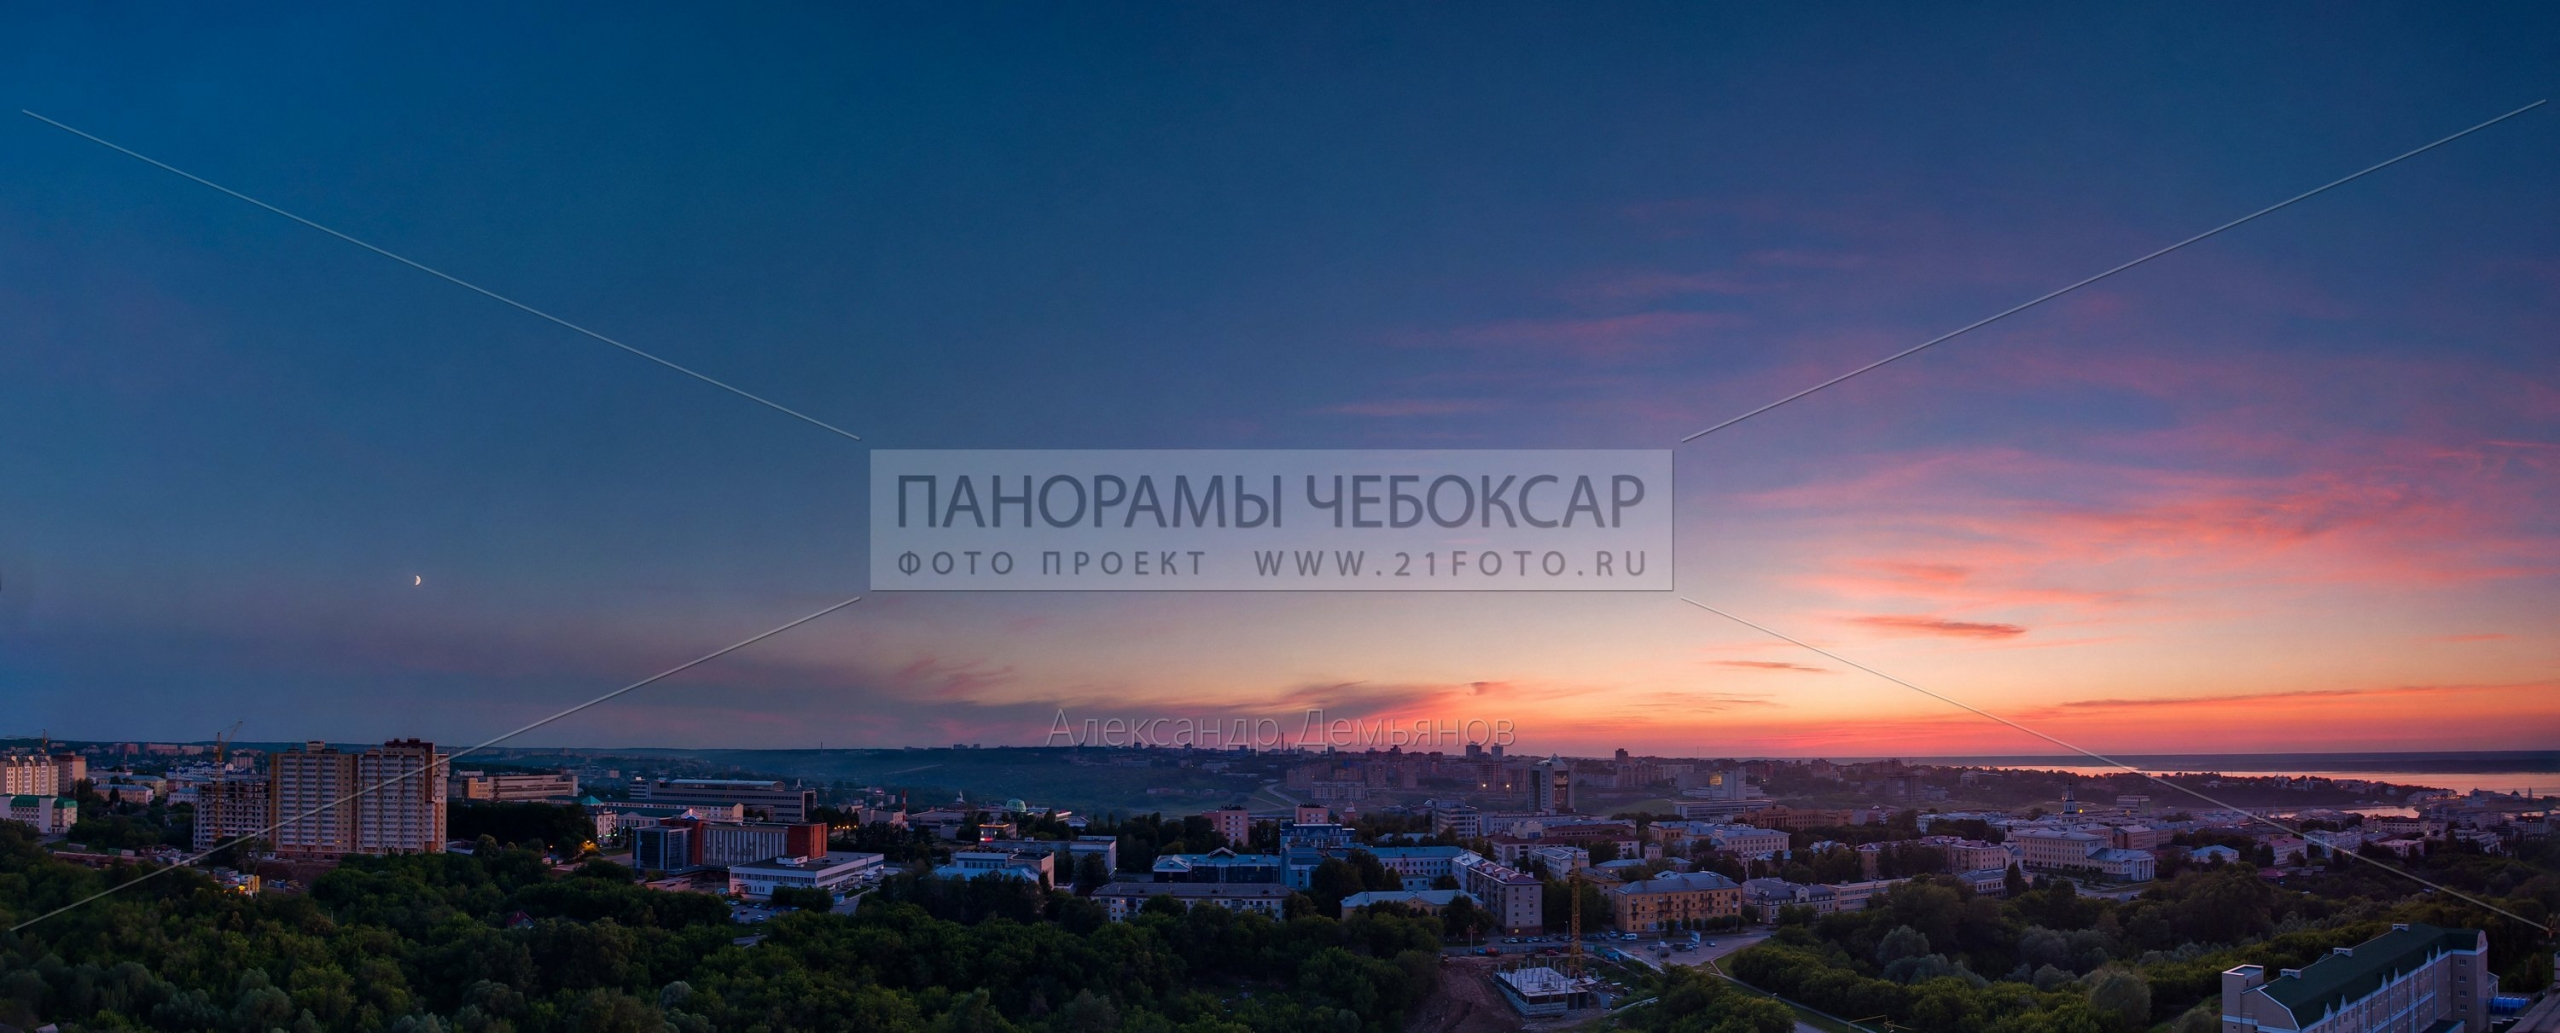 Центр города Чебоксары солнце на горизонте